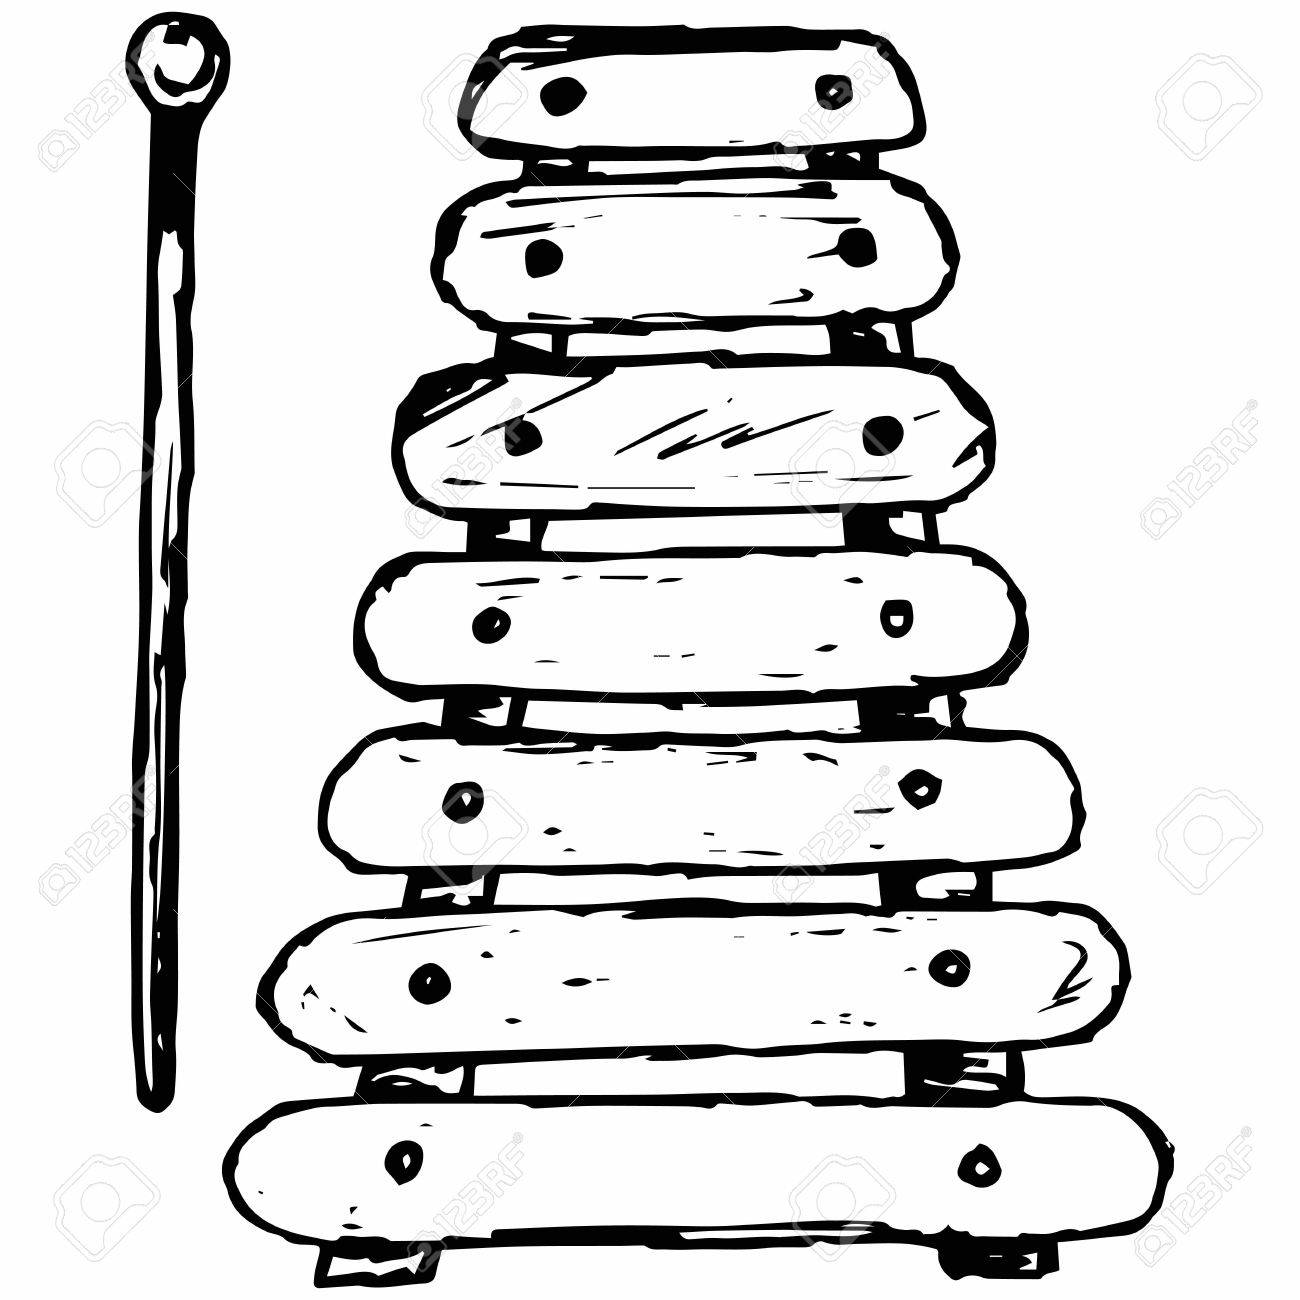 Estilo De Dibujo Instrumento Musical Del Xilófono